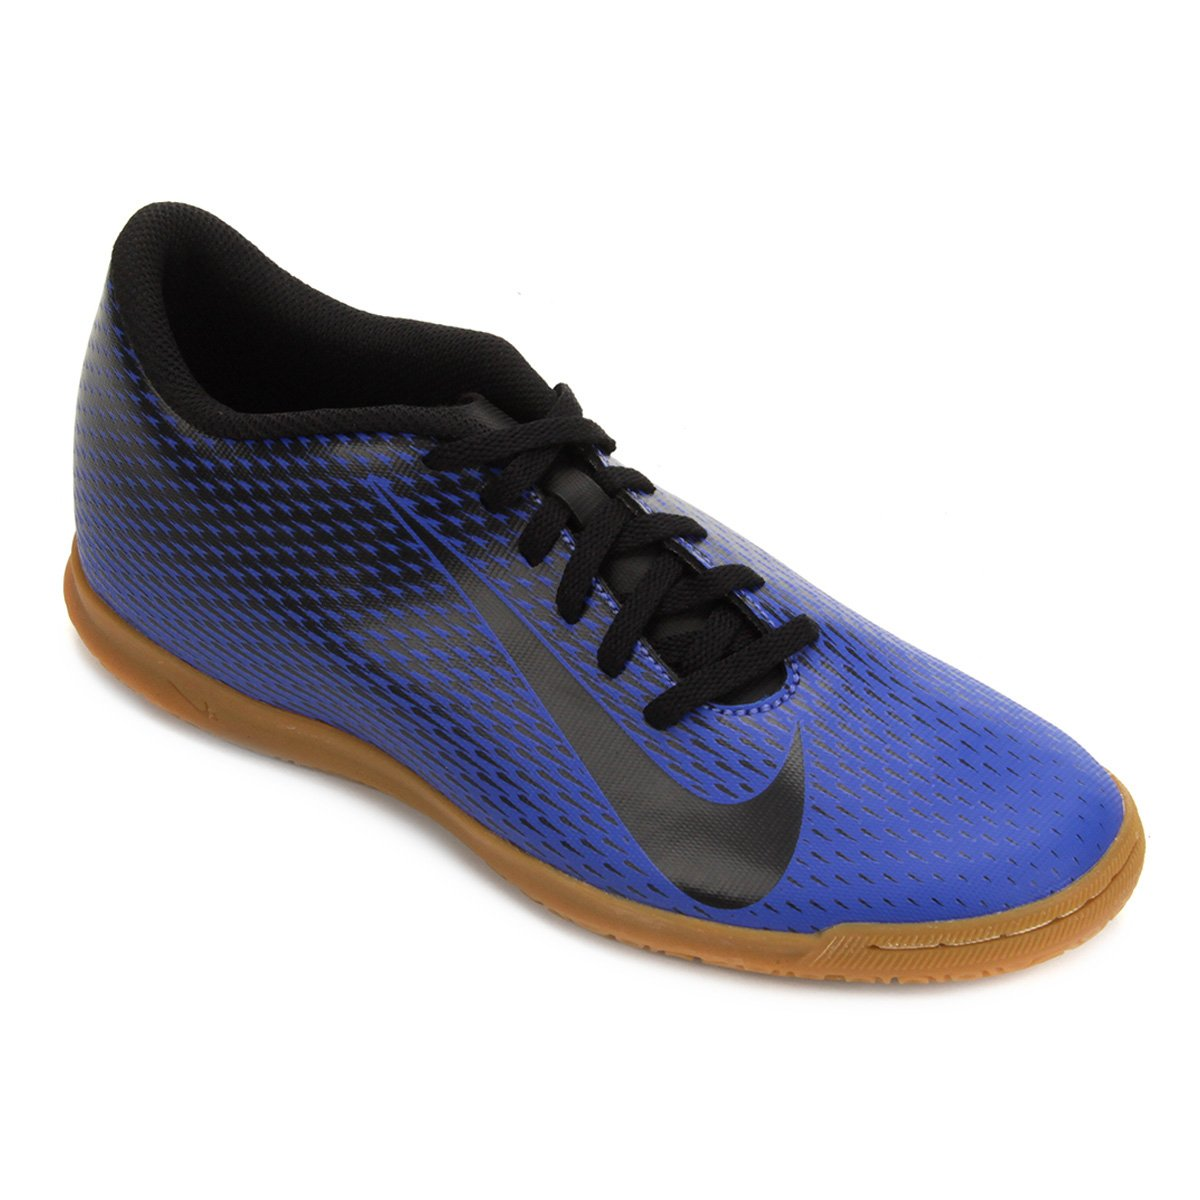 1b159824bf6b5 Chuteira Futsal Nike Bravata 2 IC - Azul e Preto - Compre Agora ...